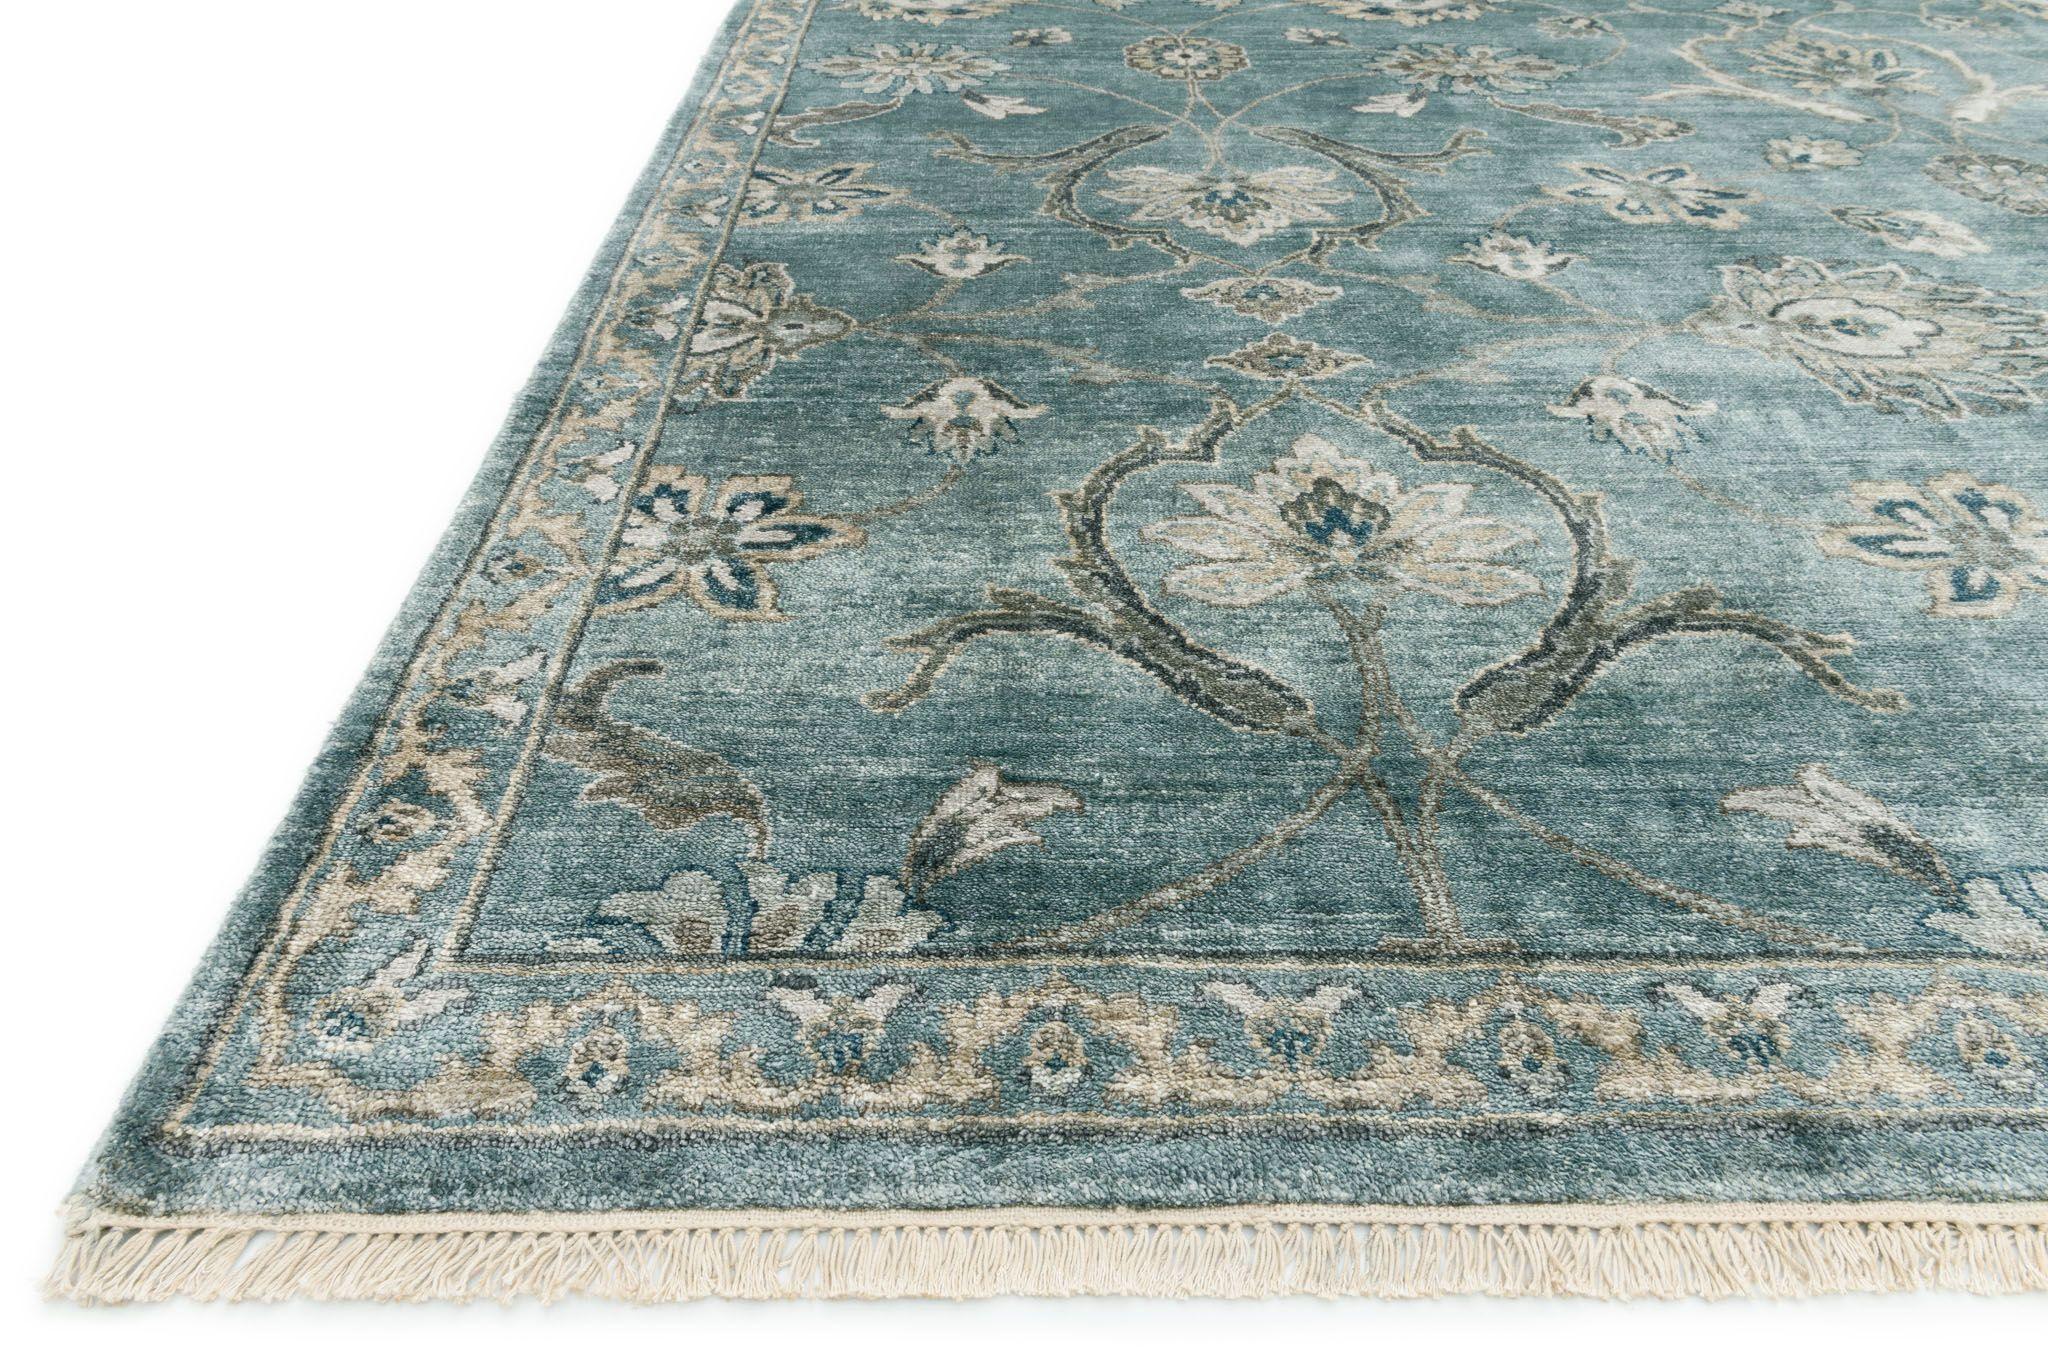 KG 01 Blue Fog Kensington Collection area rugs